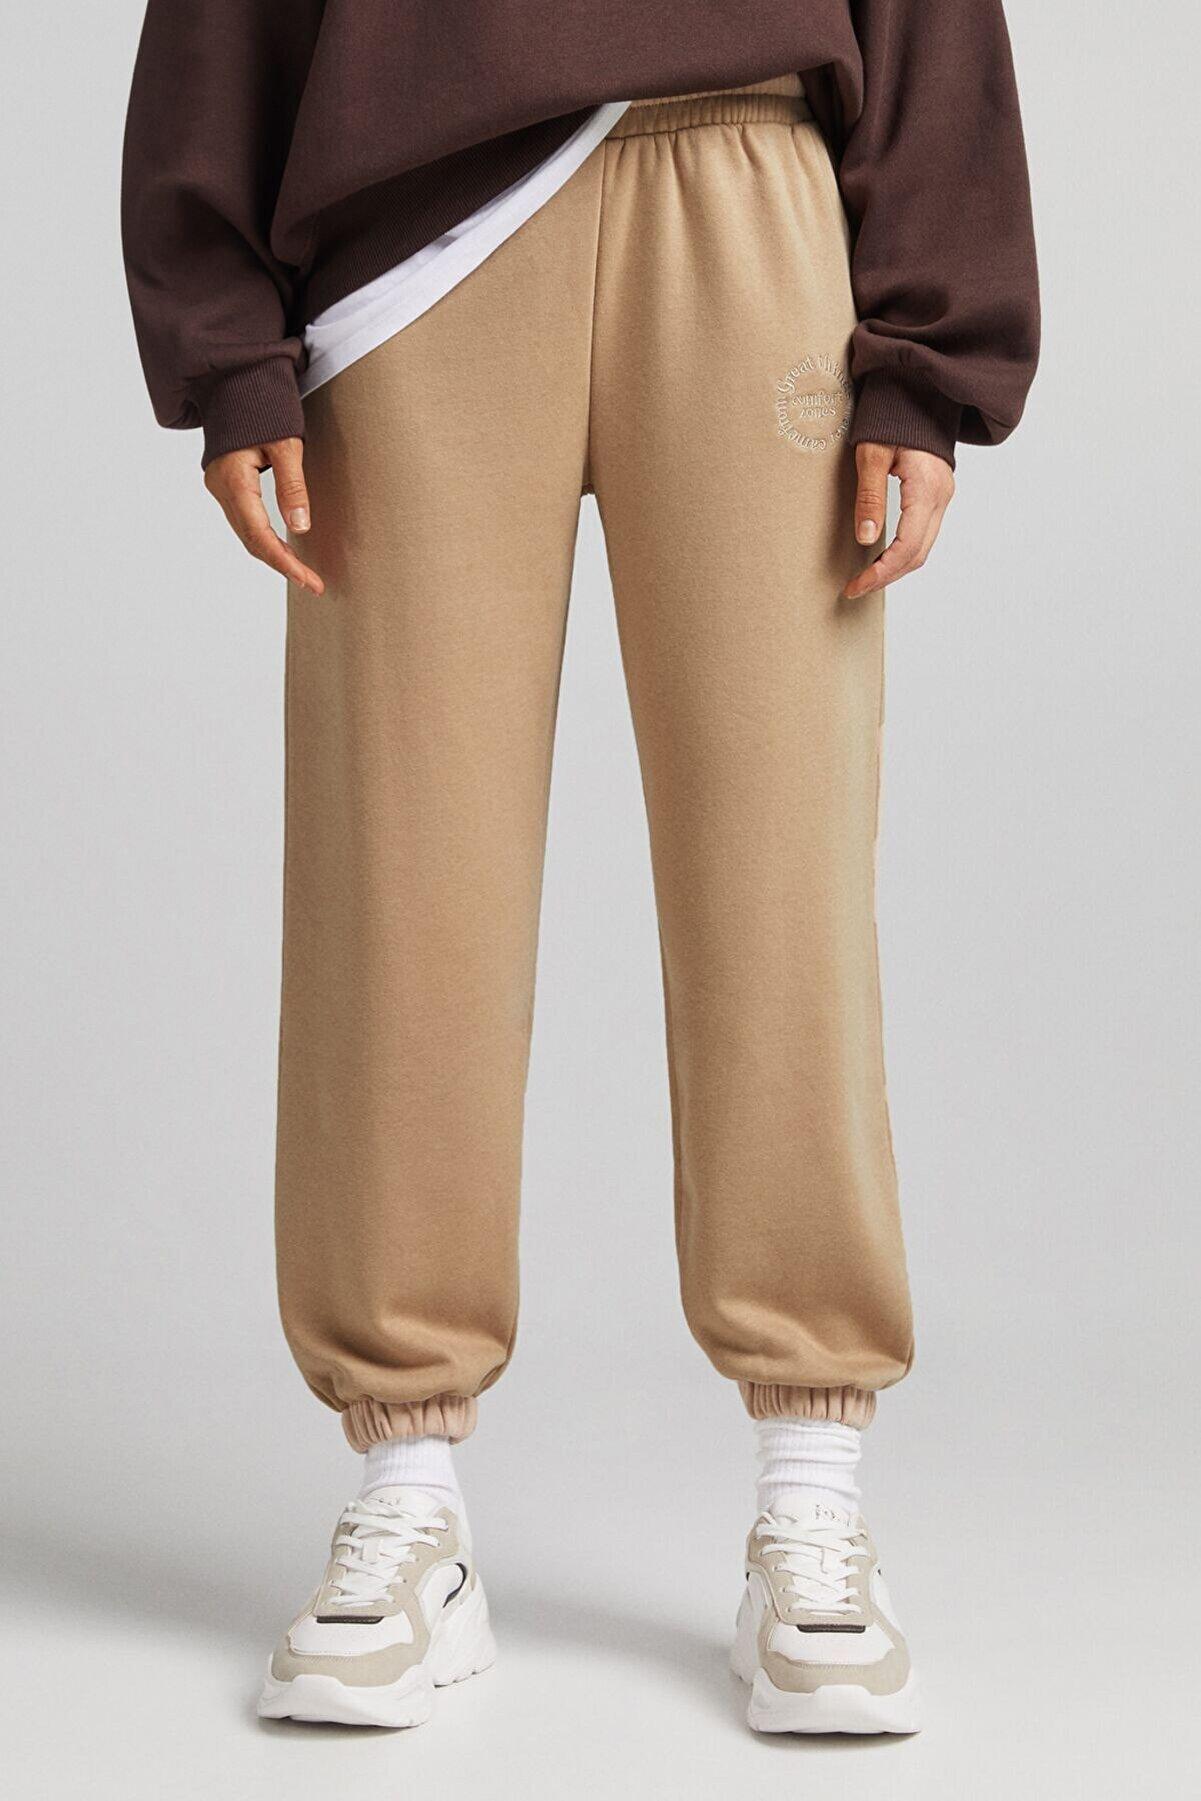 Bershka Kadın Deve Tüyü Rengi Koton Jogging Fit Pantolon